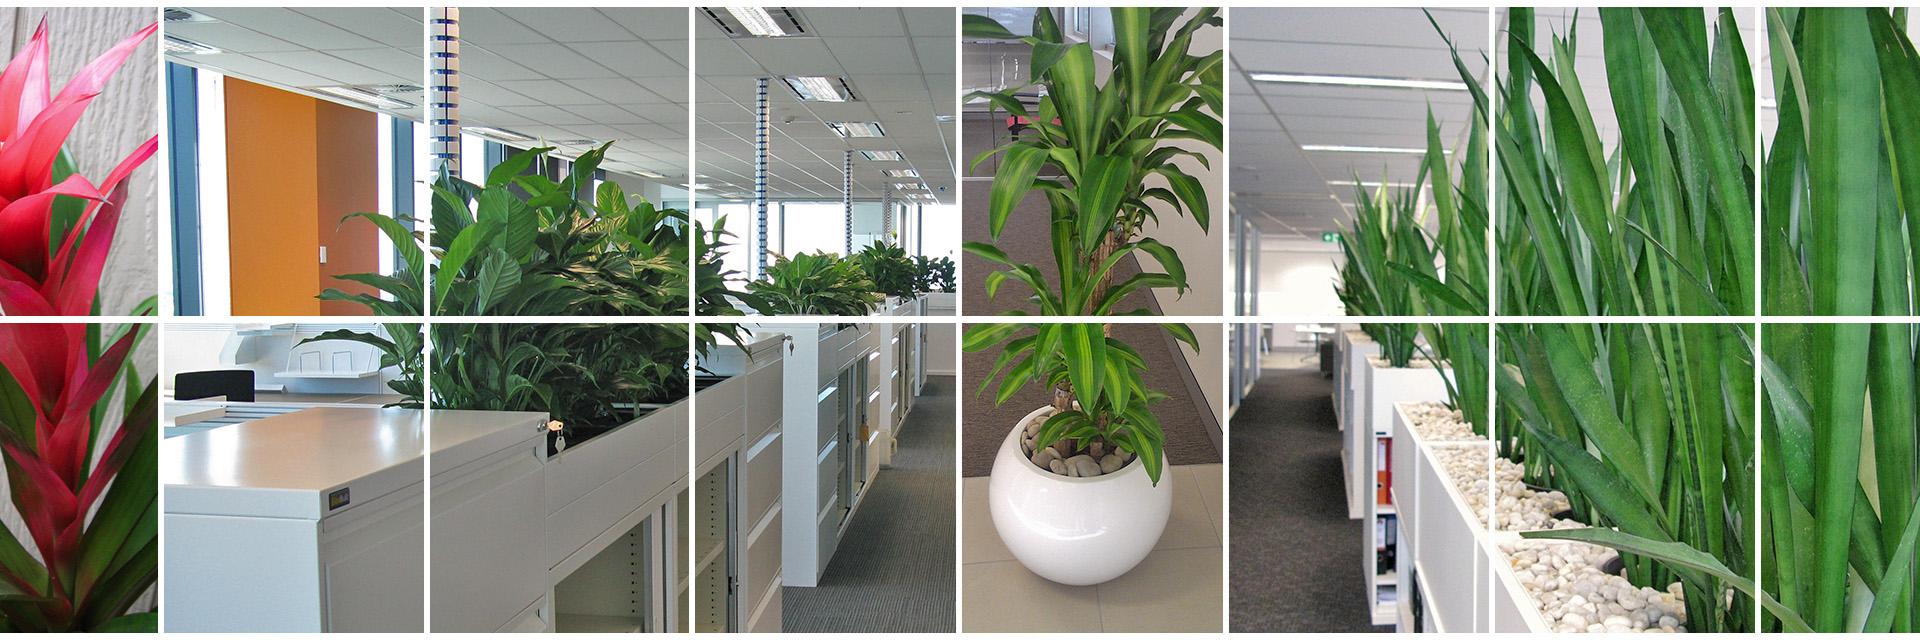 banner 1 - Plant Rental Brisbane - Trans-Plant